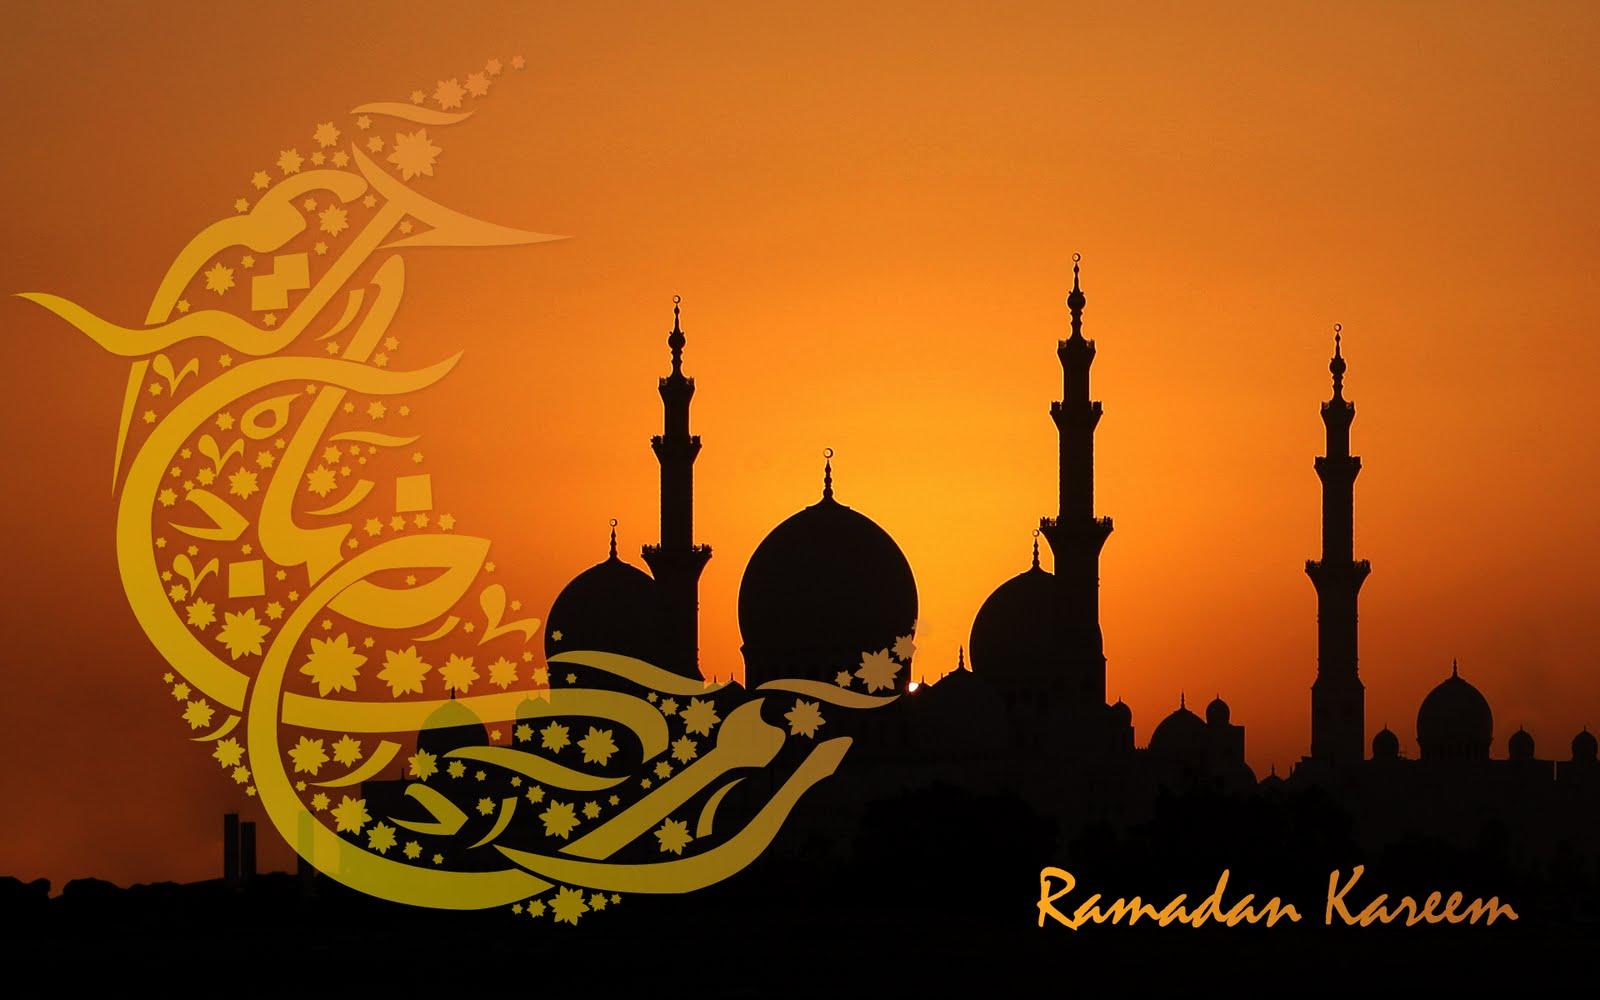 Secretary\u002639;s Remarks: On the Occasion of Ramadan  U.S. Embassy \u0026 Consulates in Saudi Arabia